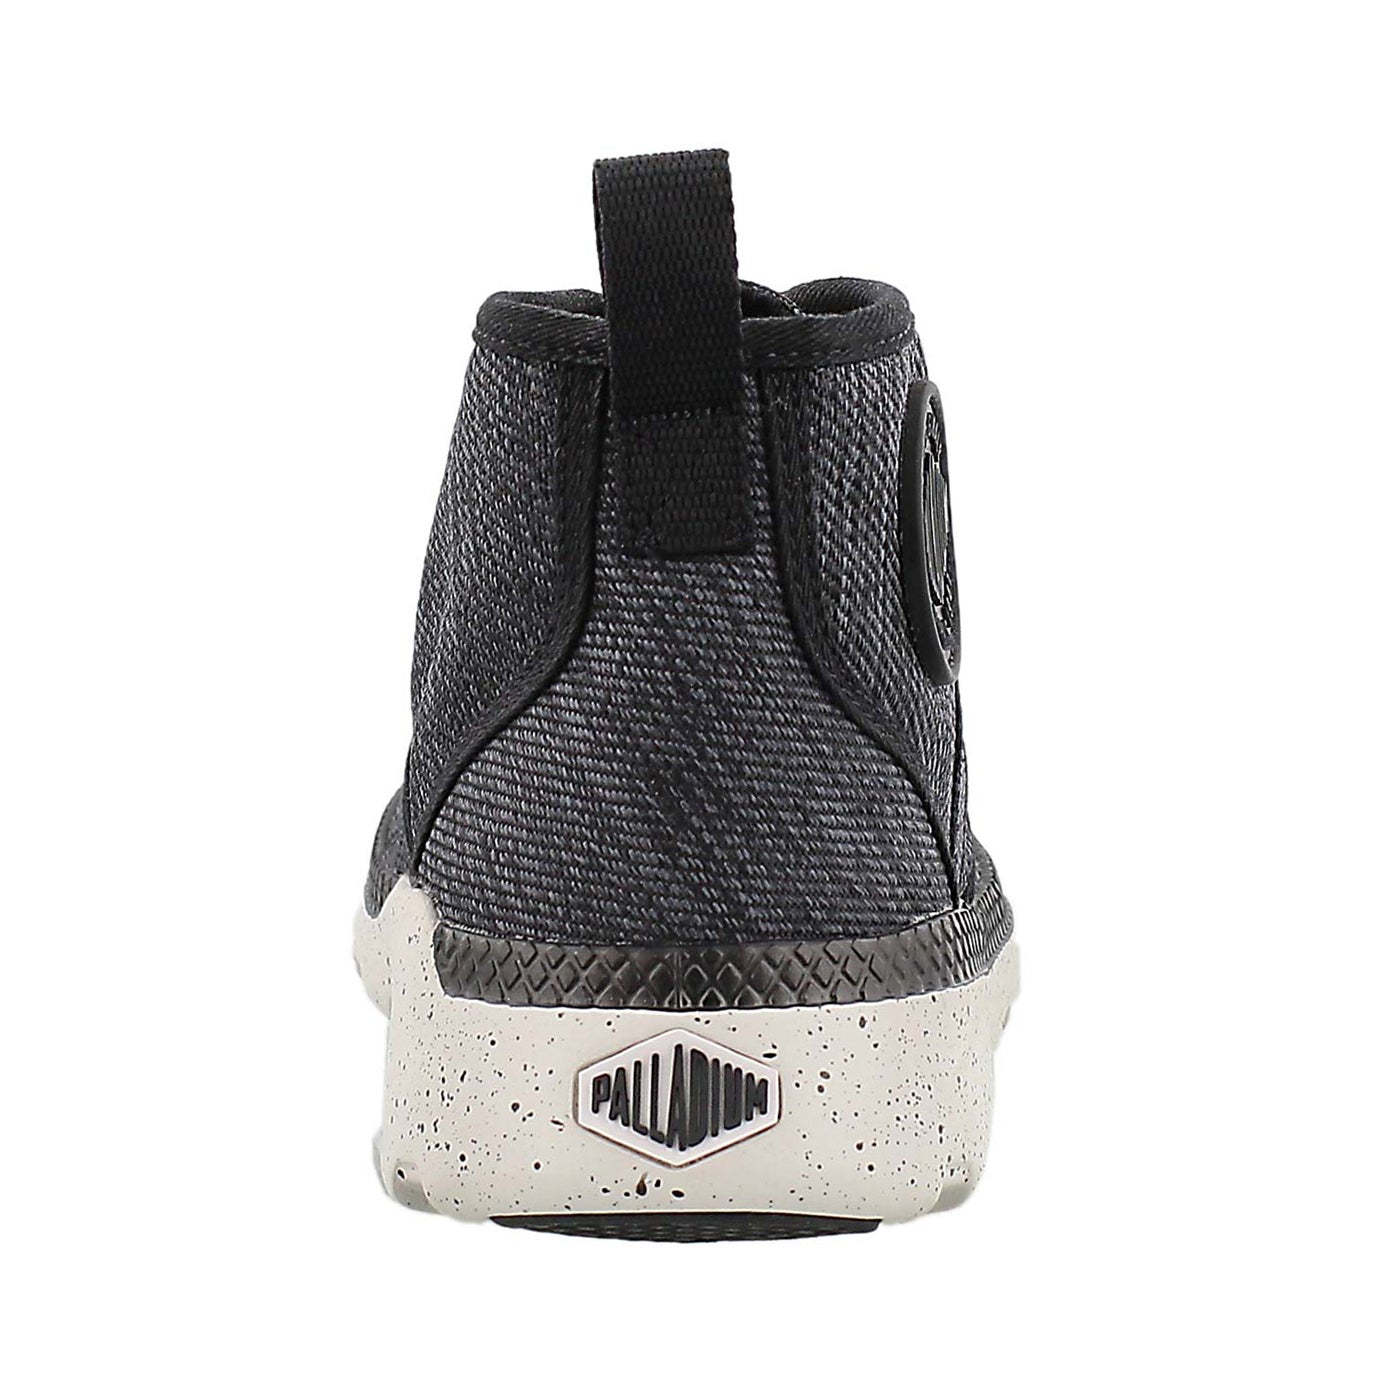 Lds Pallaville Hi blk/wnd chme sneaker